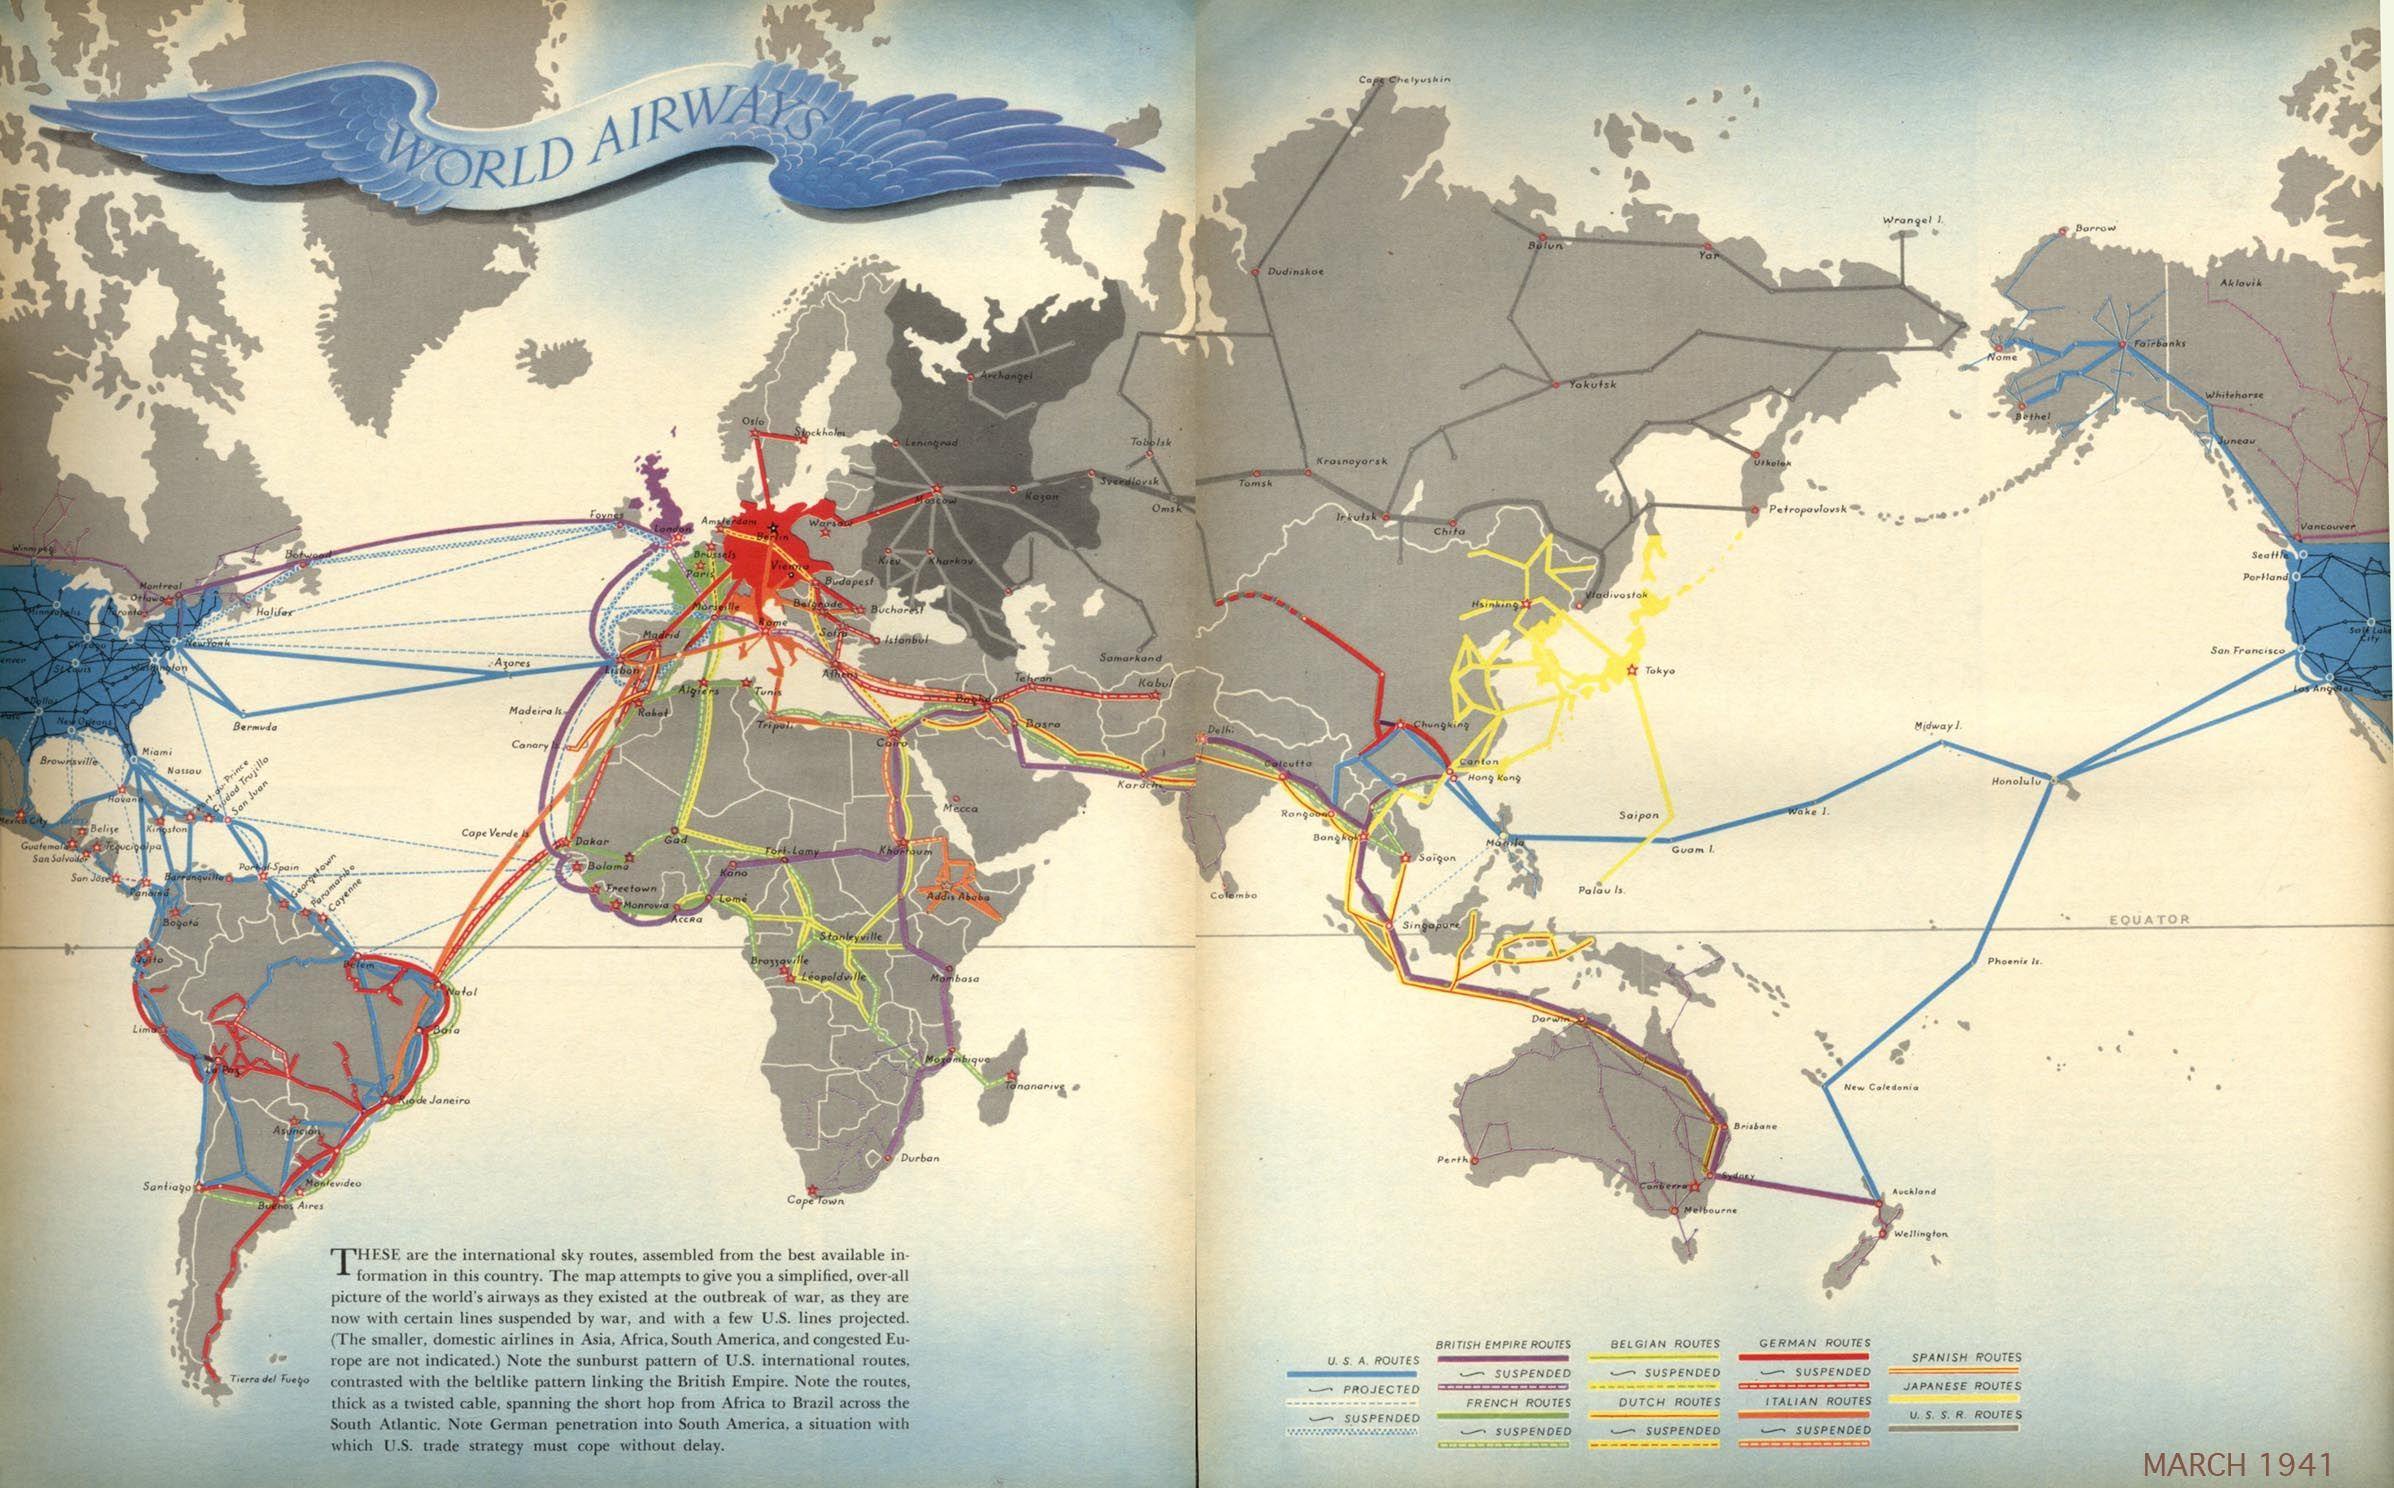 Boris Artzybasheffu0027s Worldu0027s airways Fortune Magazine ca